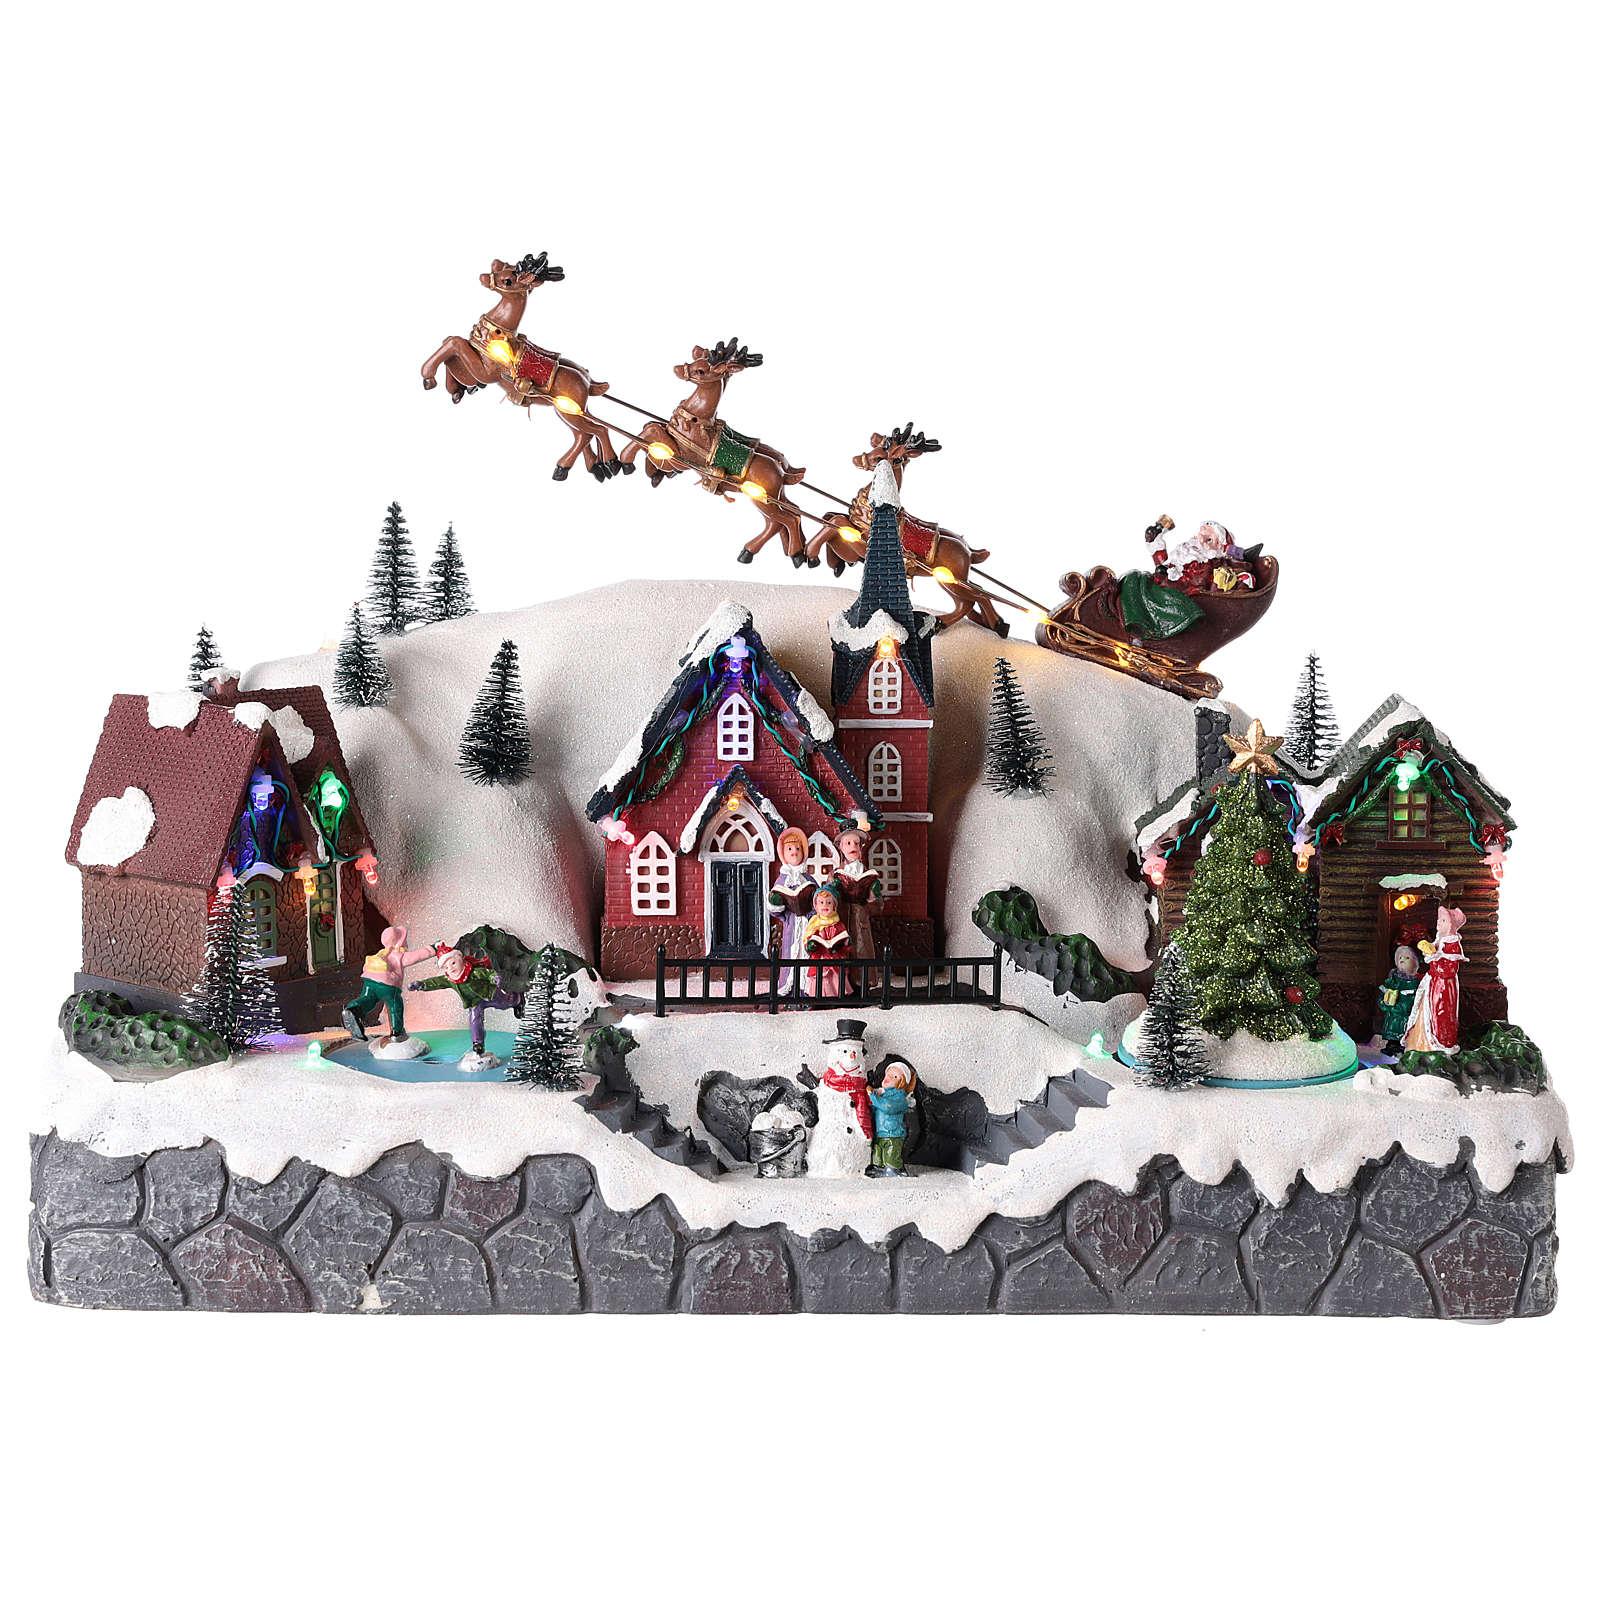 Christmas village with Santa sleigh in resin 25x40x20 cm 3